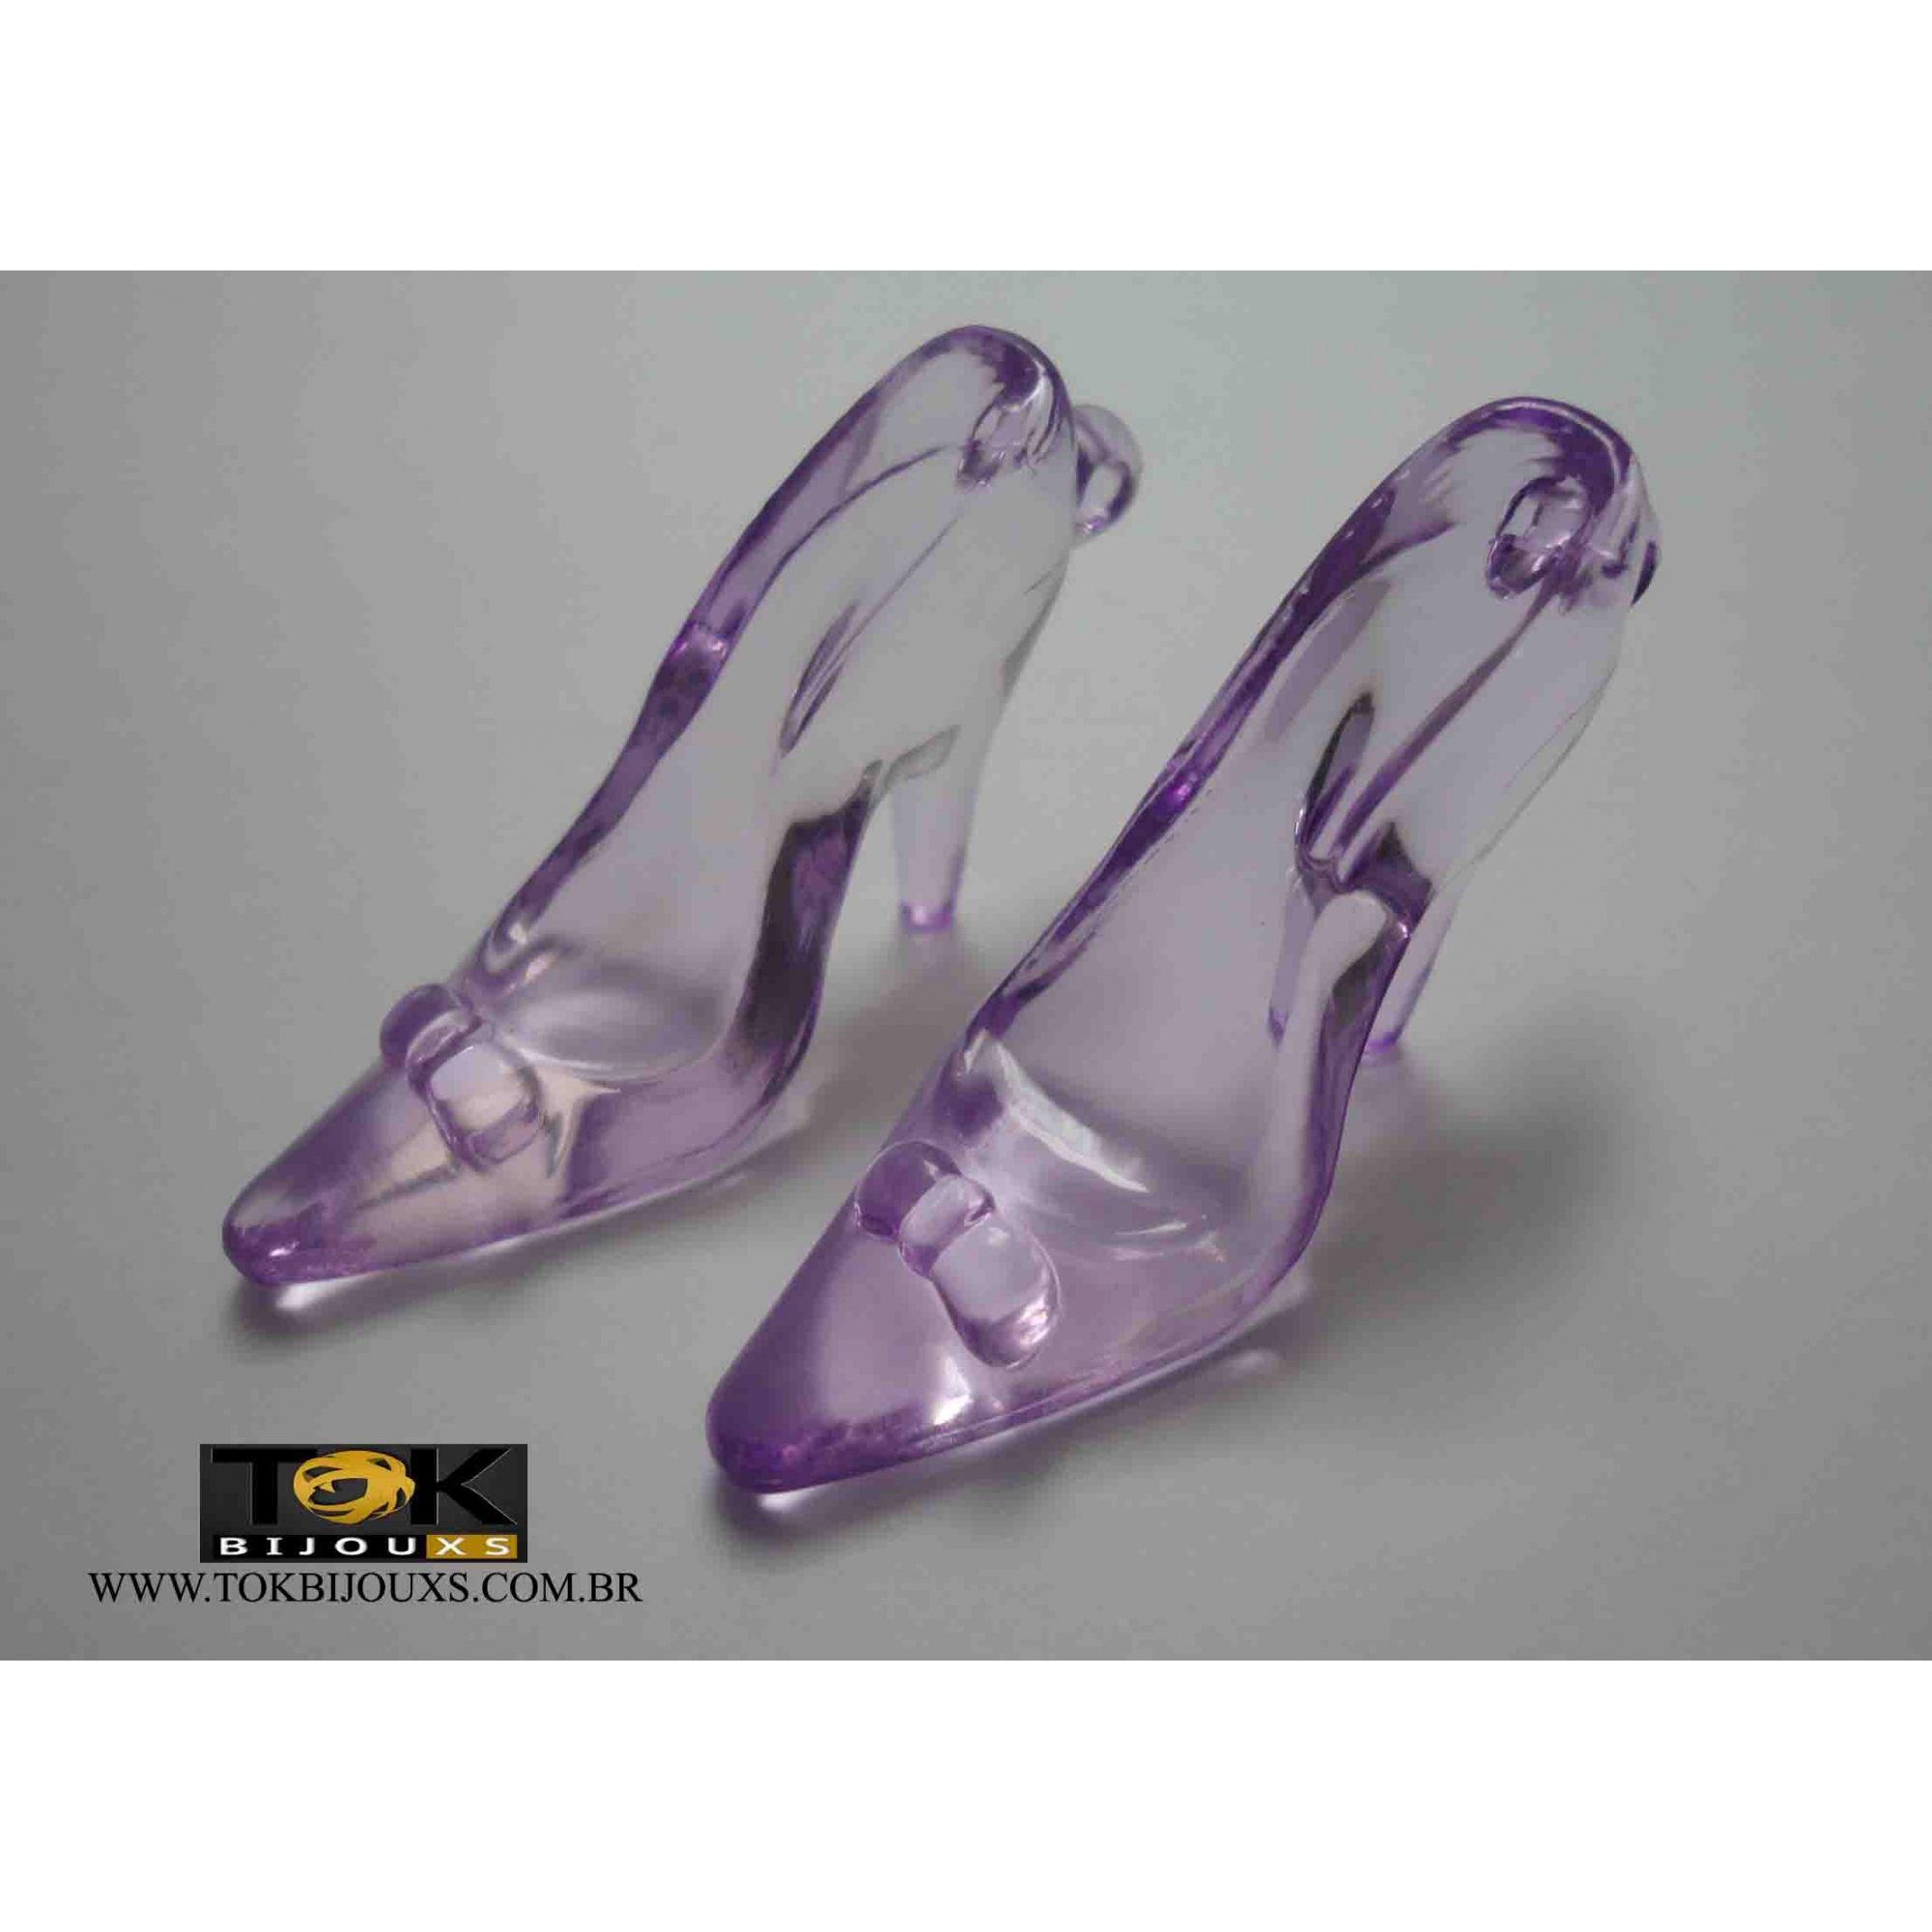 Atacado - Sapato Acrílico Grande - Lilás - 500g